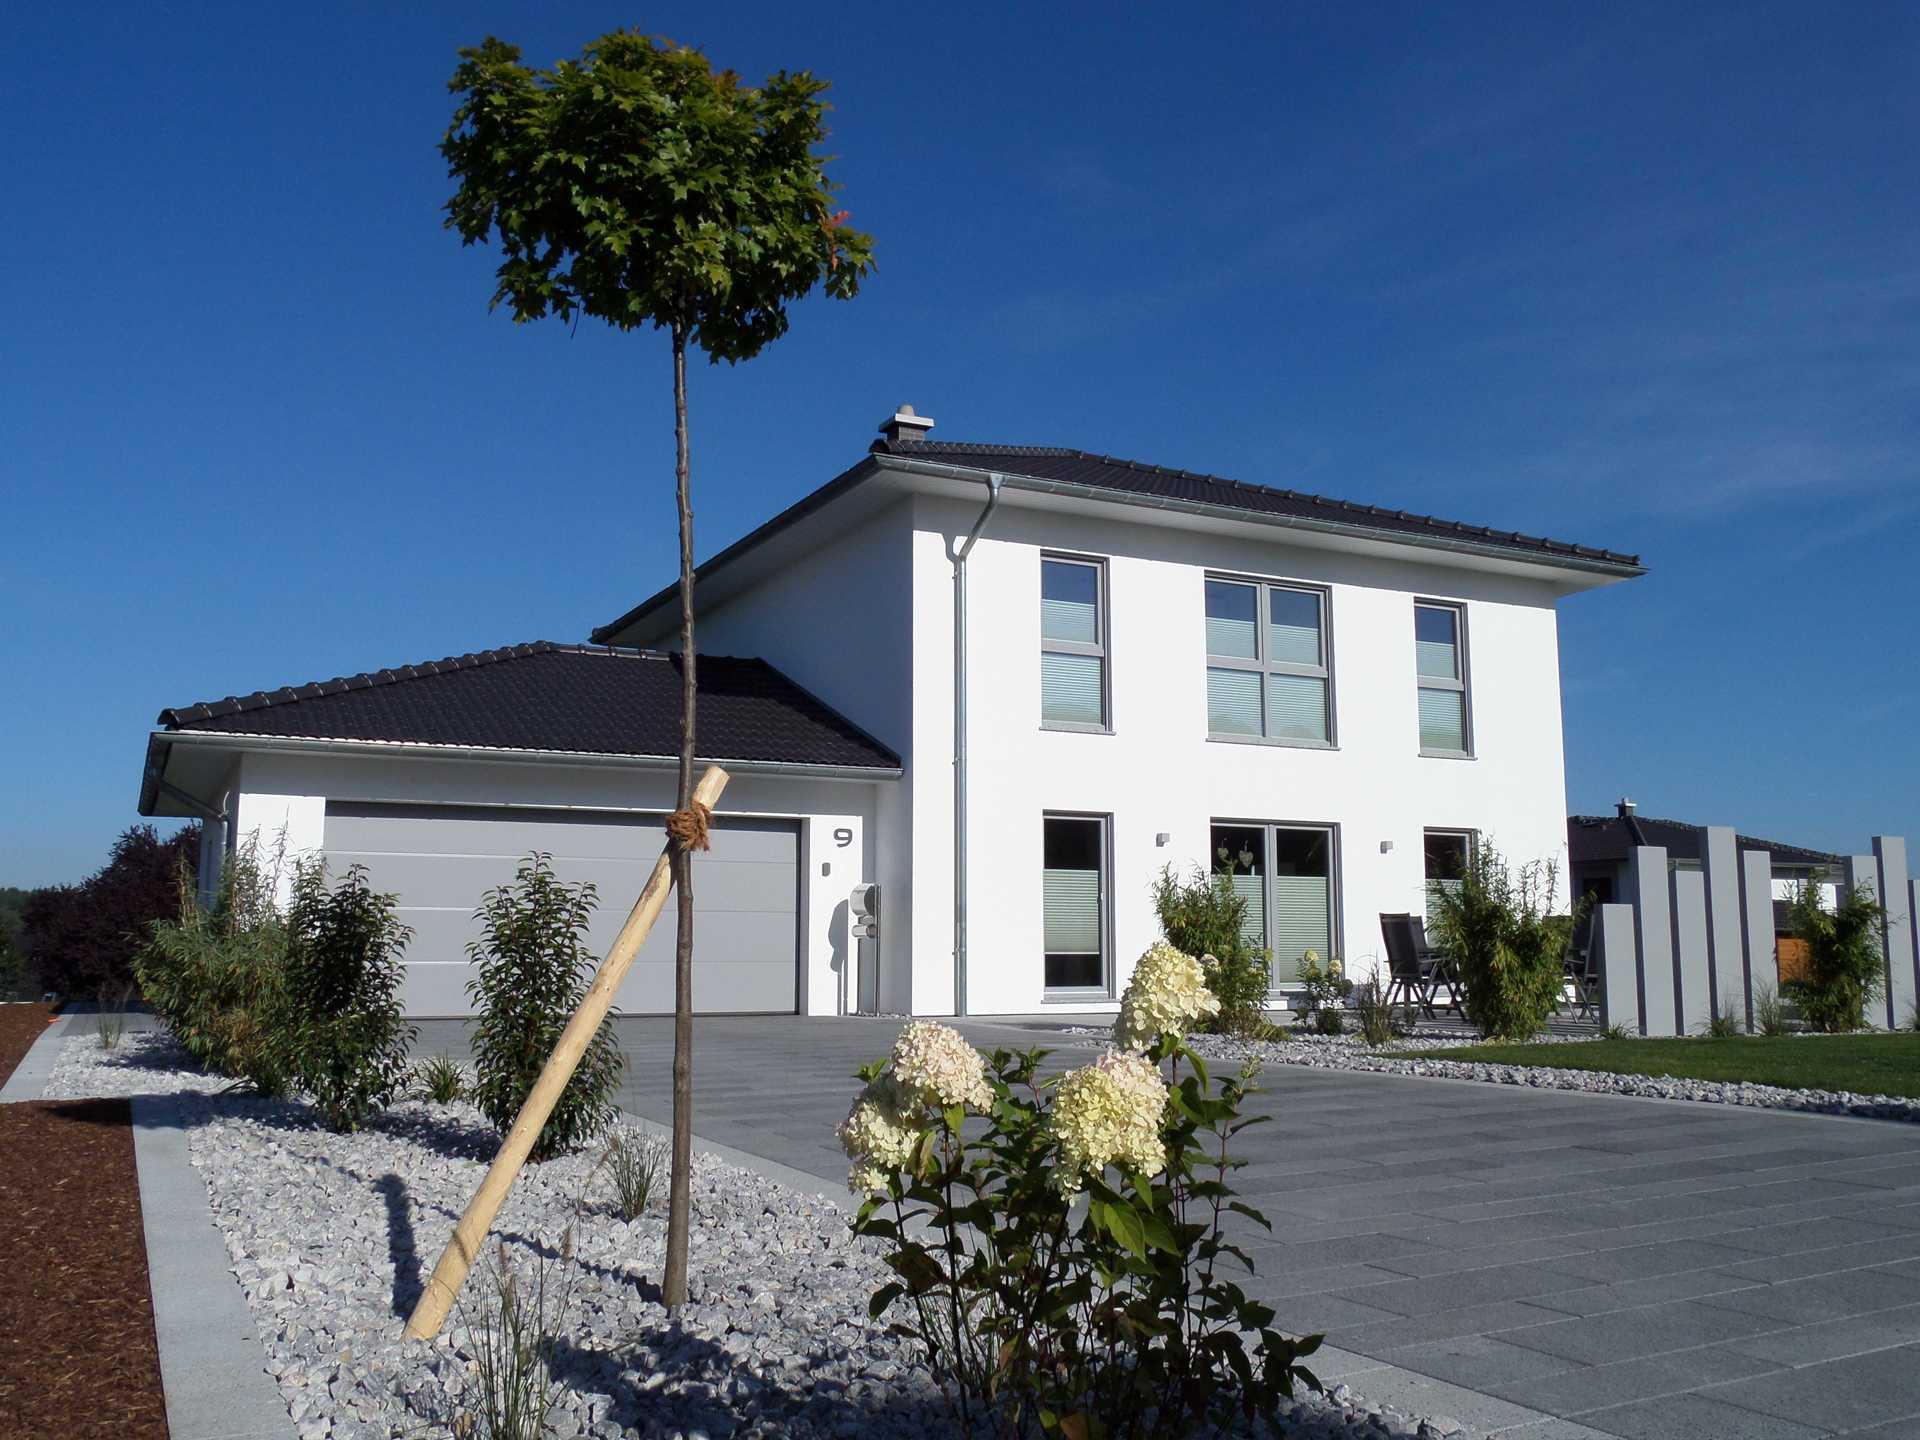 Stadtvilla z fingerhut haus for Stadtvilla zweifamilienhaus